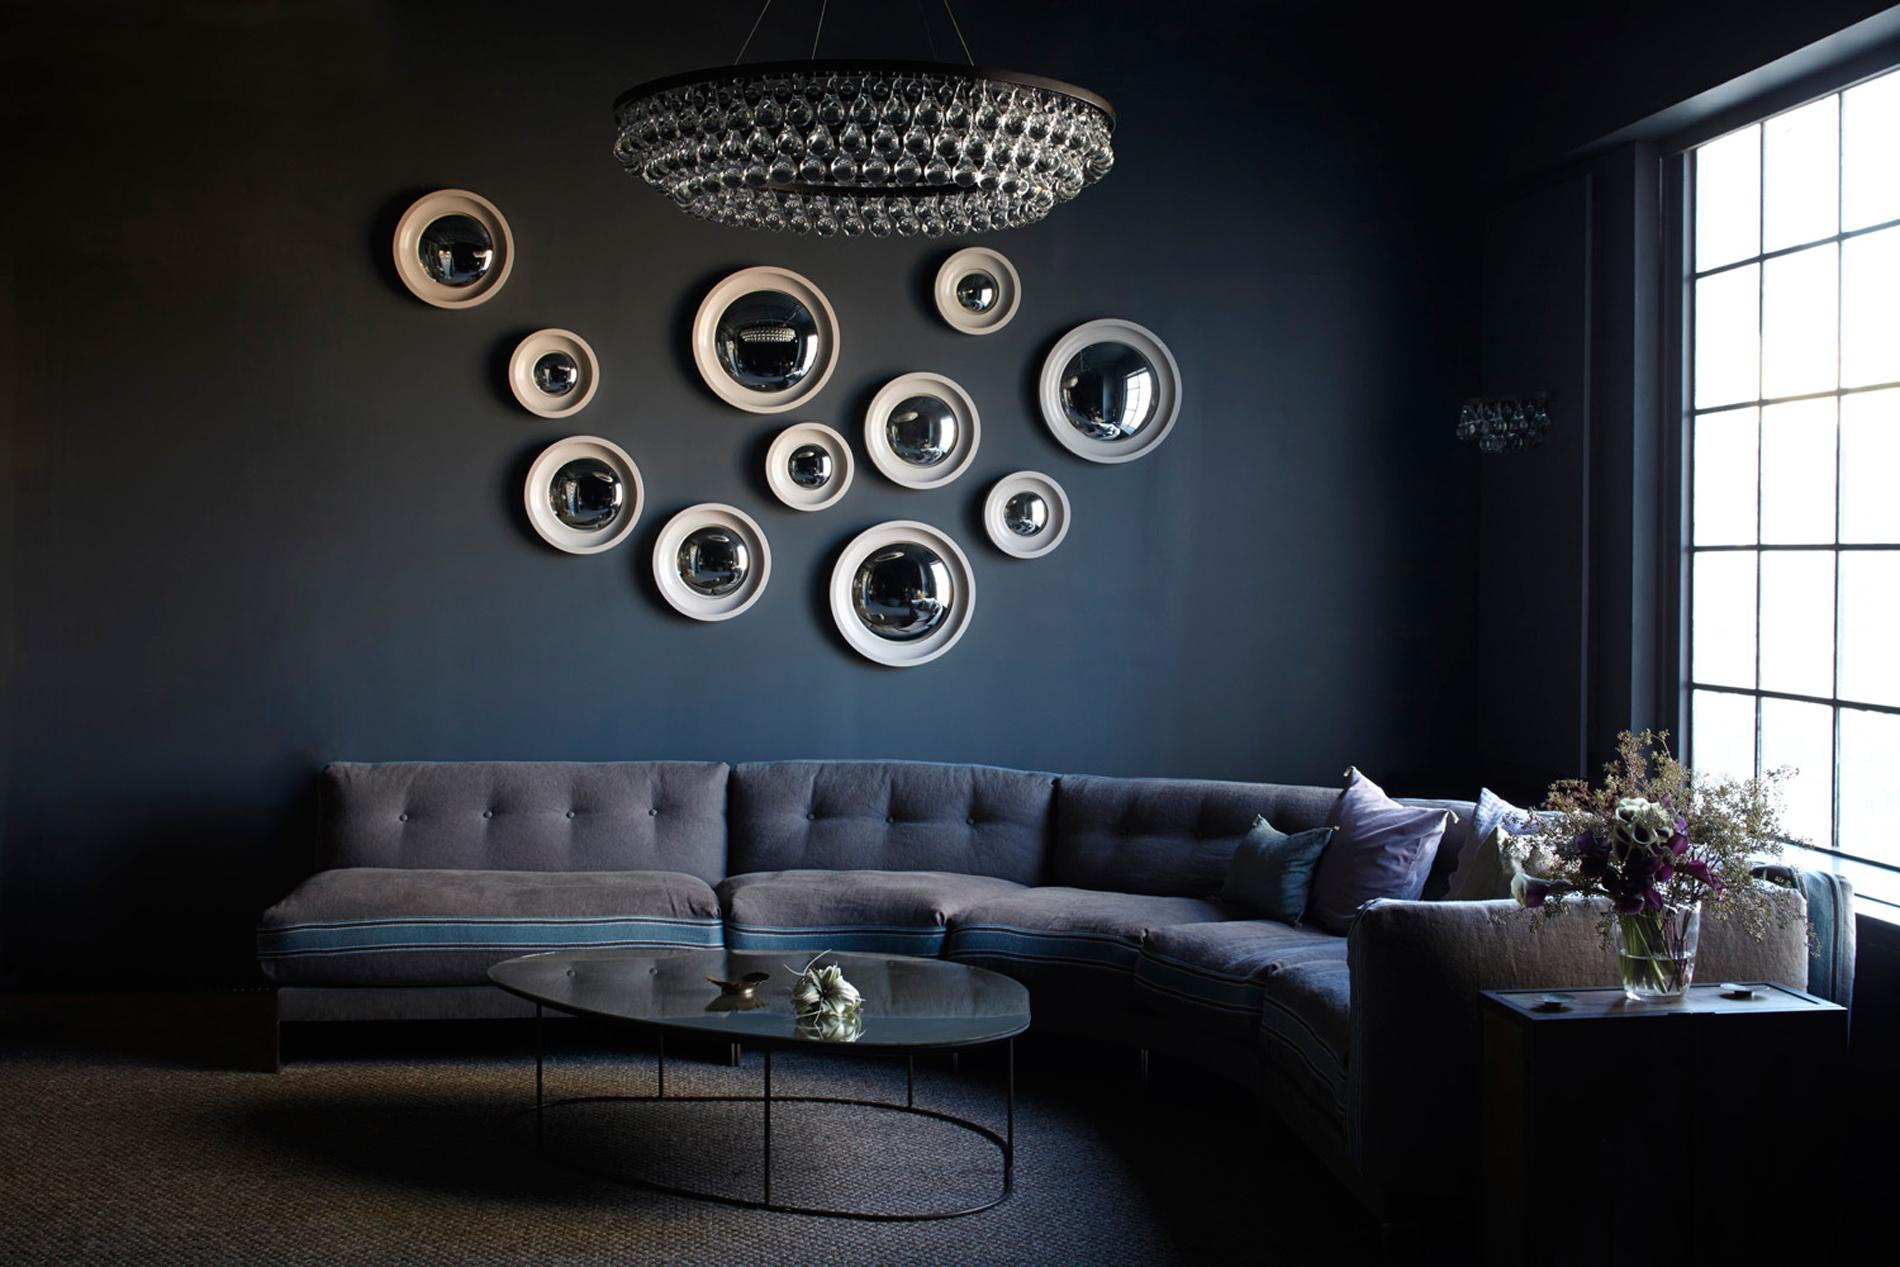 comment bien utiliser le miroir en d co madame figaro. Black Bedroom Furniture Sets. Home Design Ideas